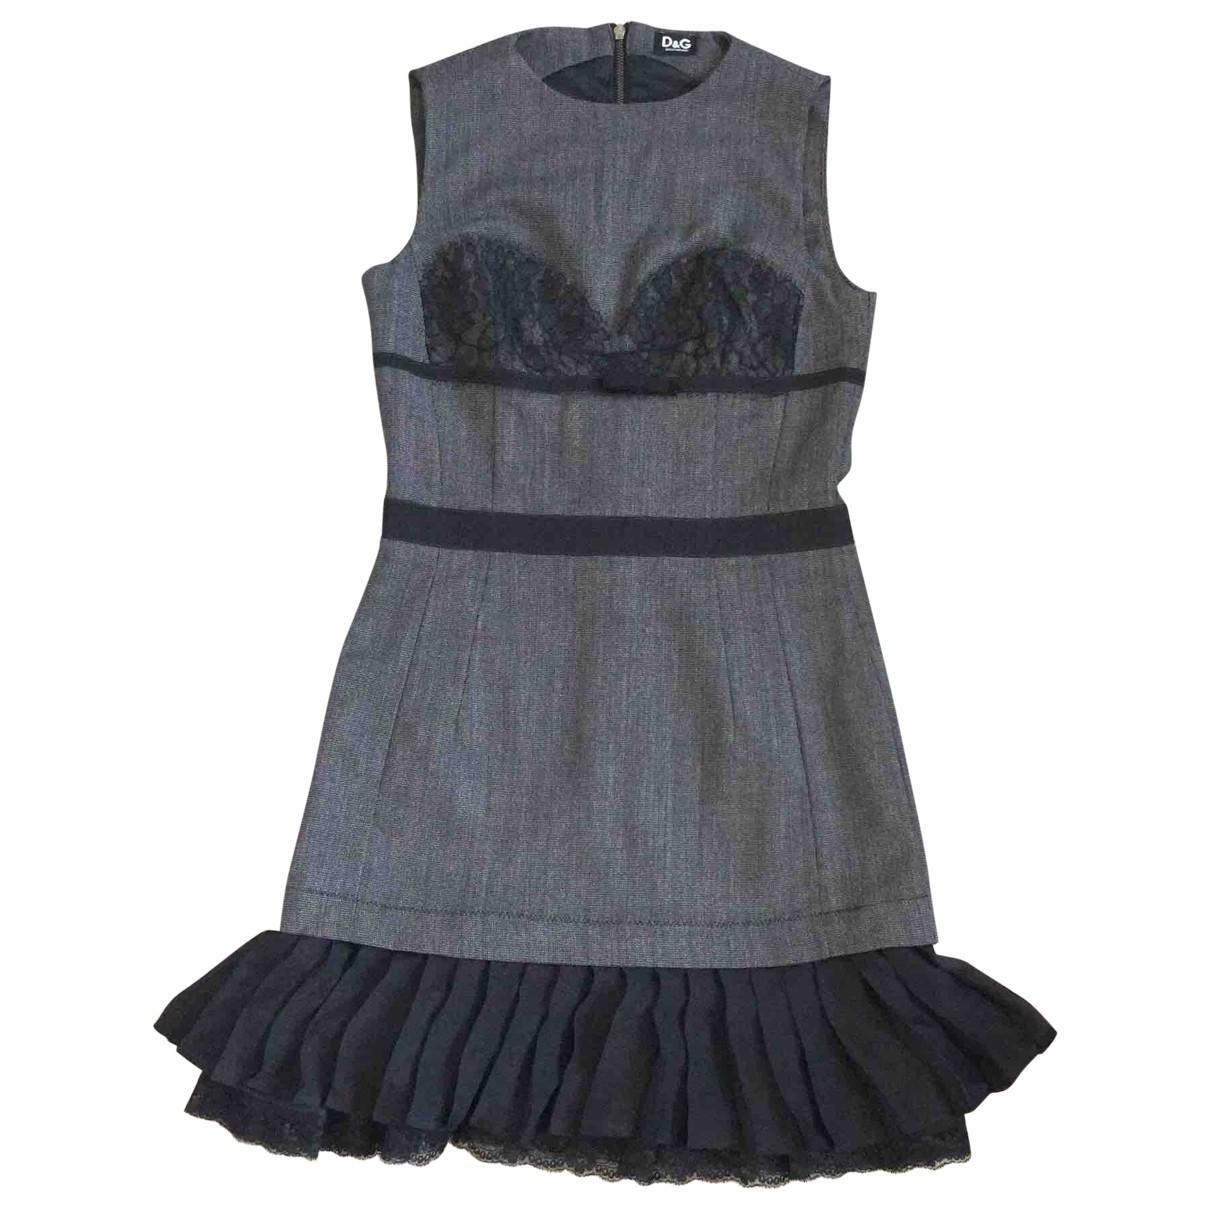 D&g \N Grey Cotton dress for Women 42 IT